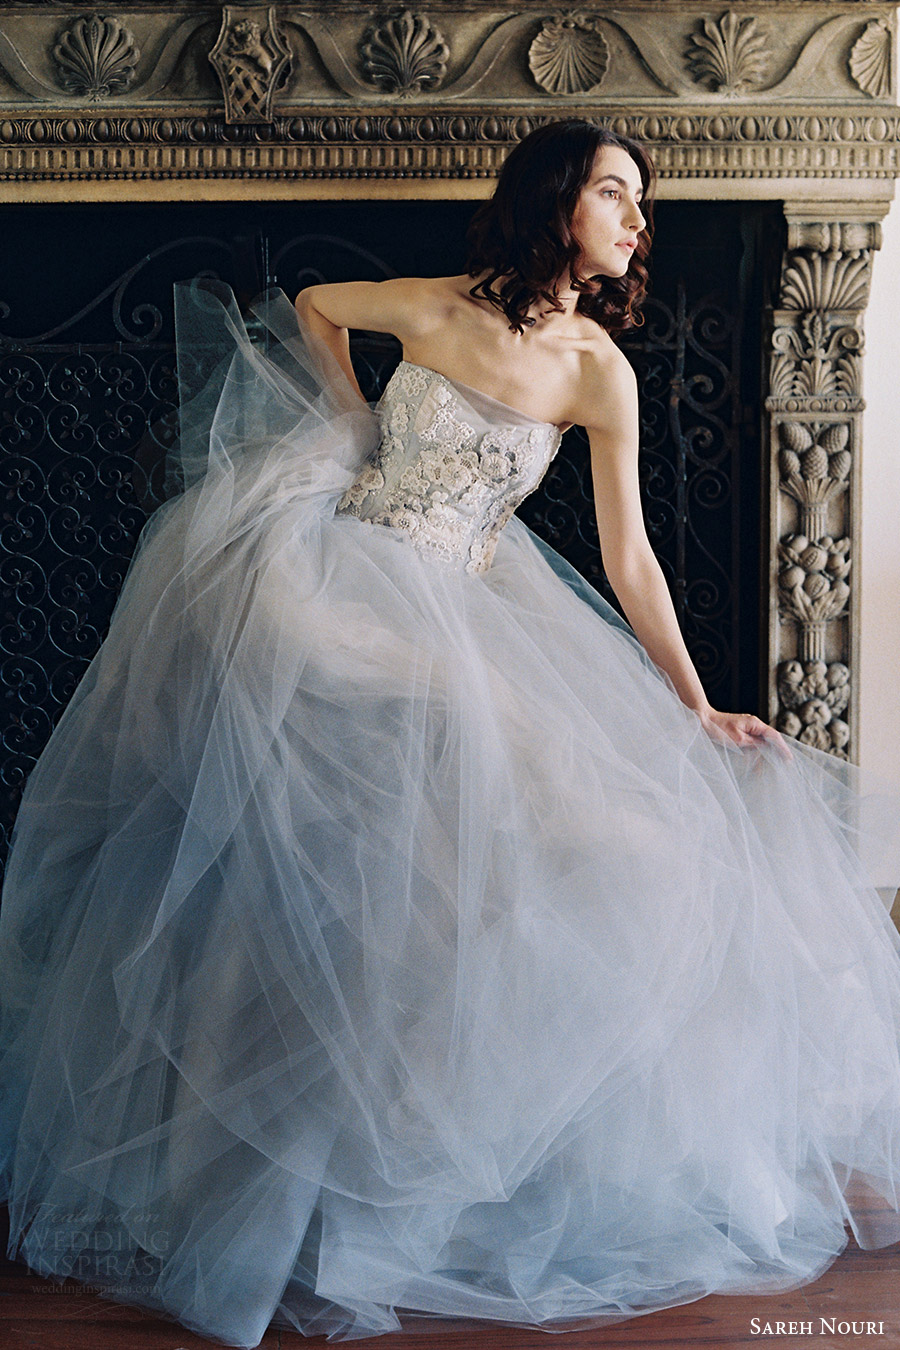 sareh nouri bridal spring 2017 strapless sweetheart ball gown wedding dress (iris) fv  gray color